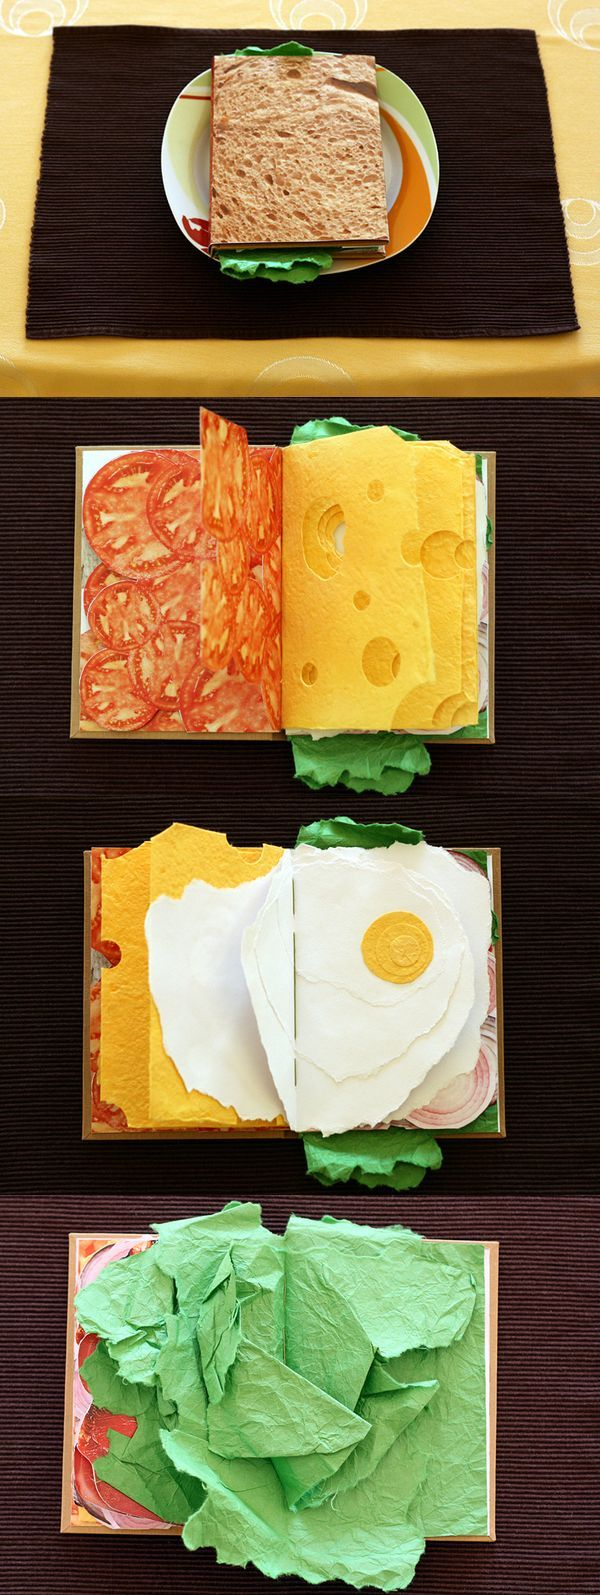 Sandwich Book by Pawel Piotrowski. 16 Creative Packaging Examples. #packaging Encontrado en enfuzed.com